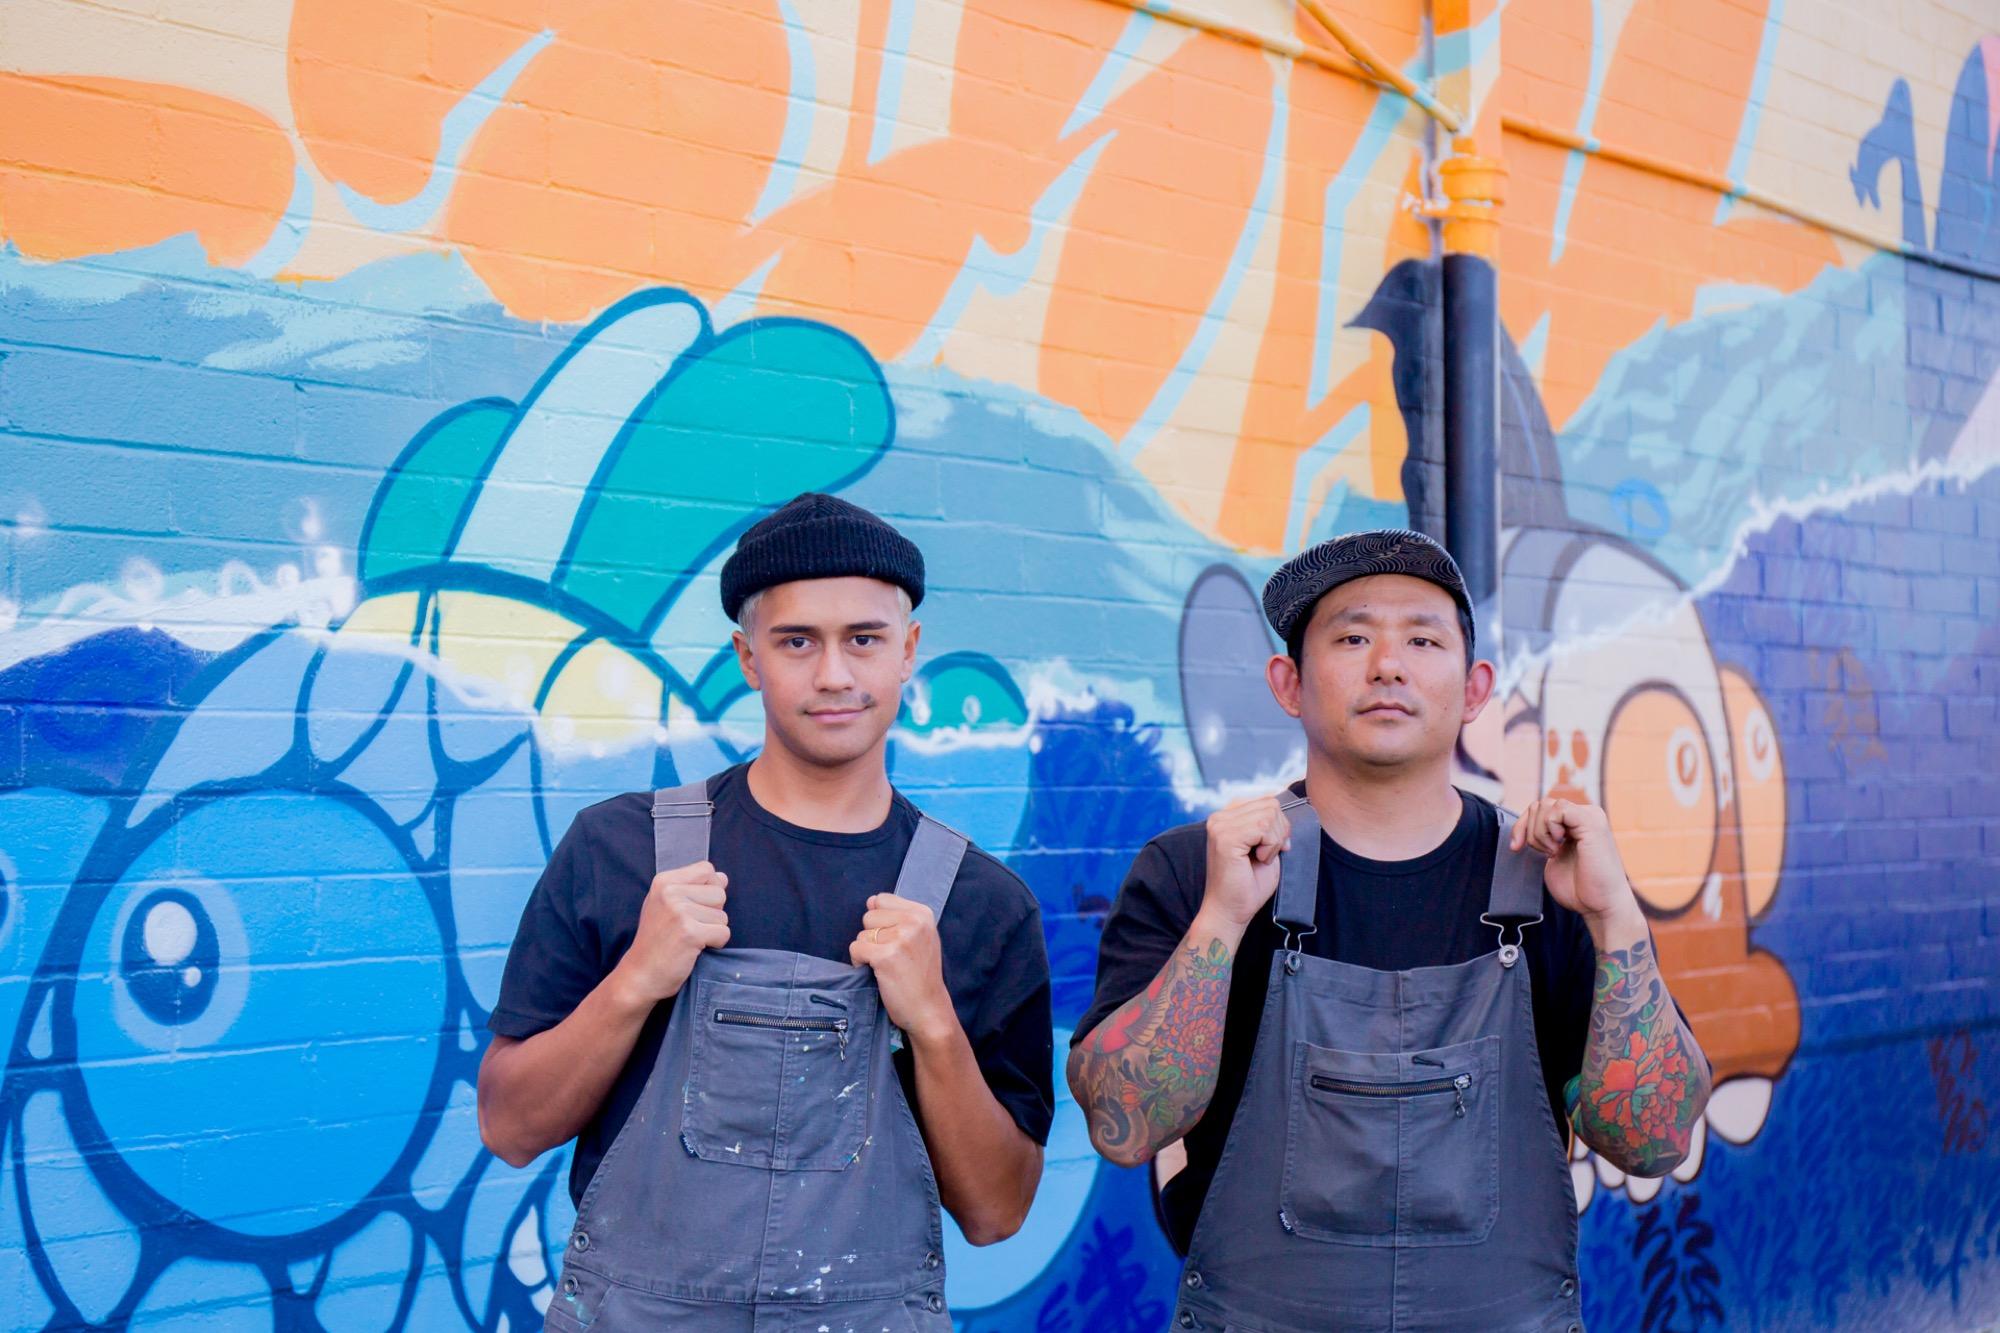 Recap: POW! WOW! Hawaii 2019 Artes & contextos pwh2019 GaryDrawsFish JackSoren lannycatcheswalls